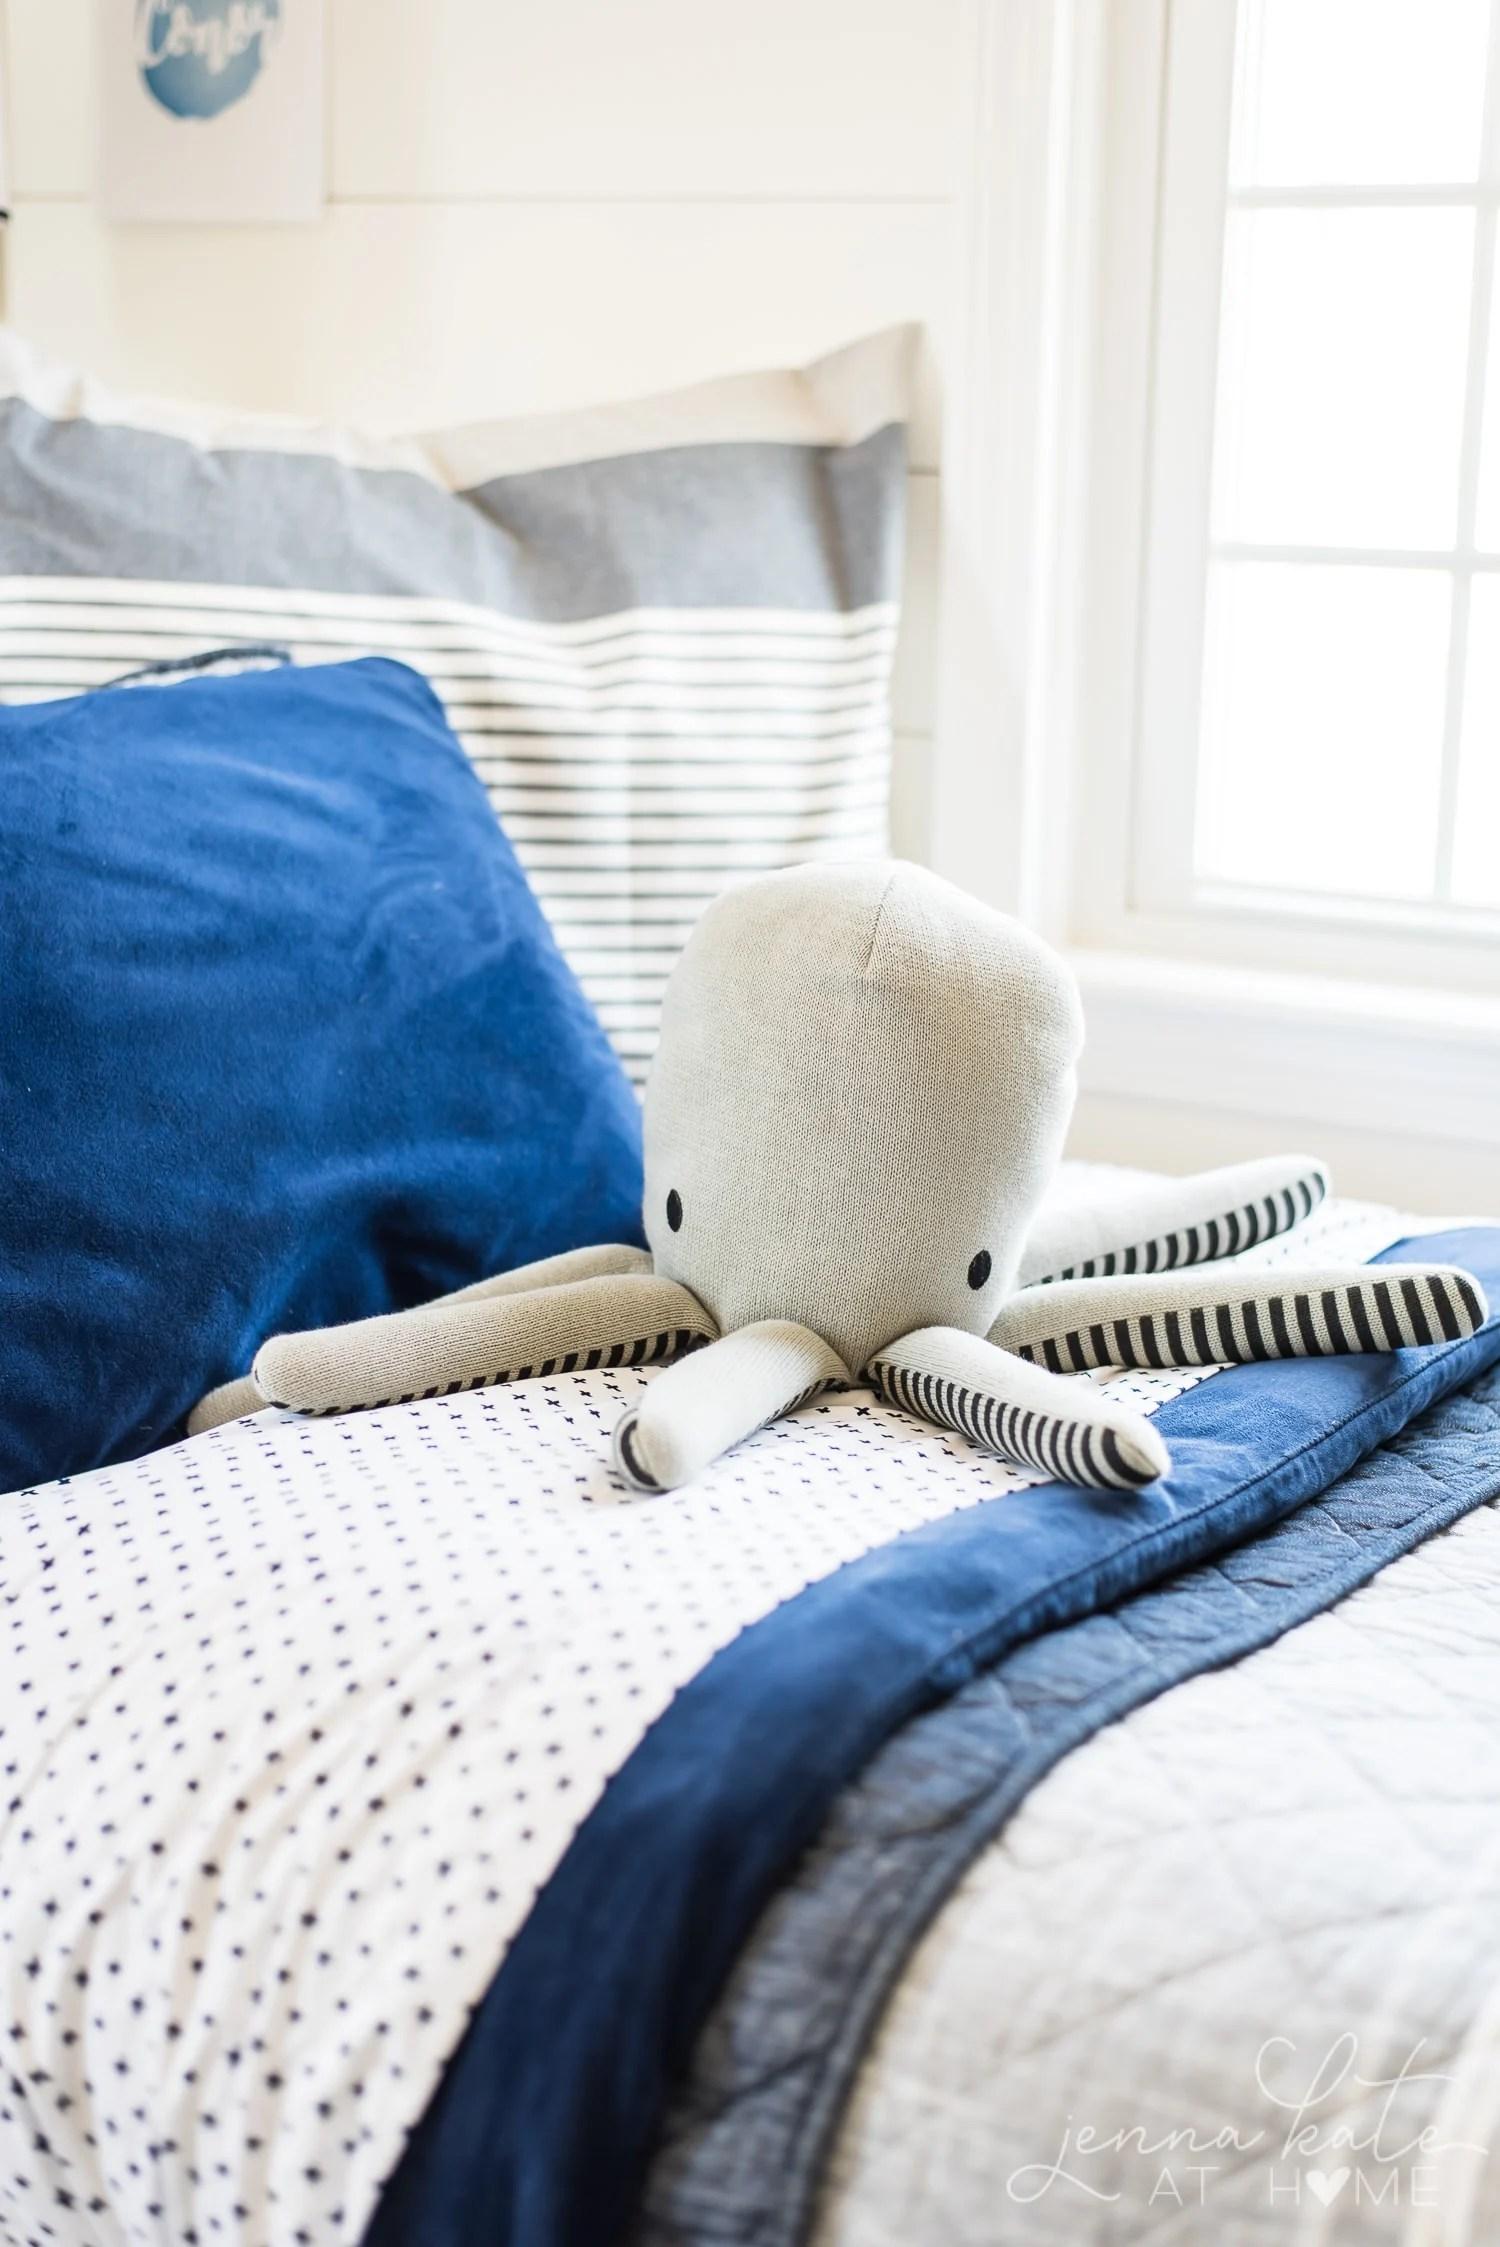 Toy octopus on bed. Fun boy bedroom decor ideas.